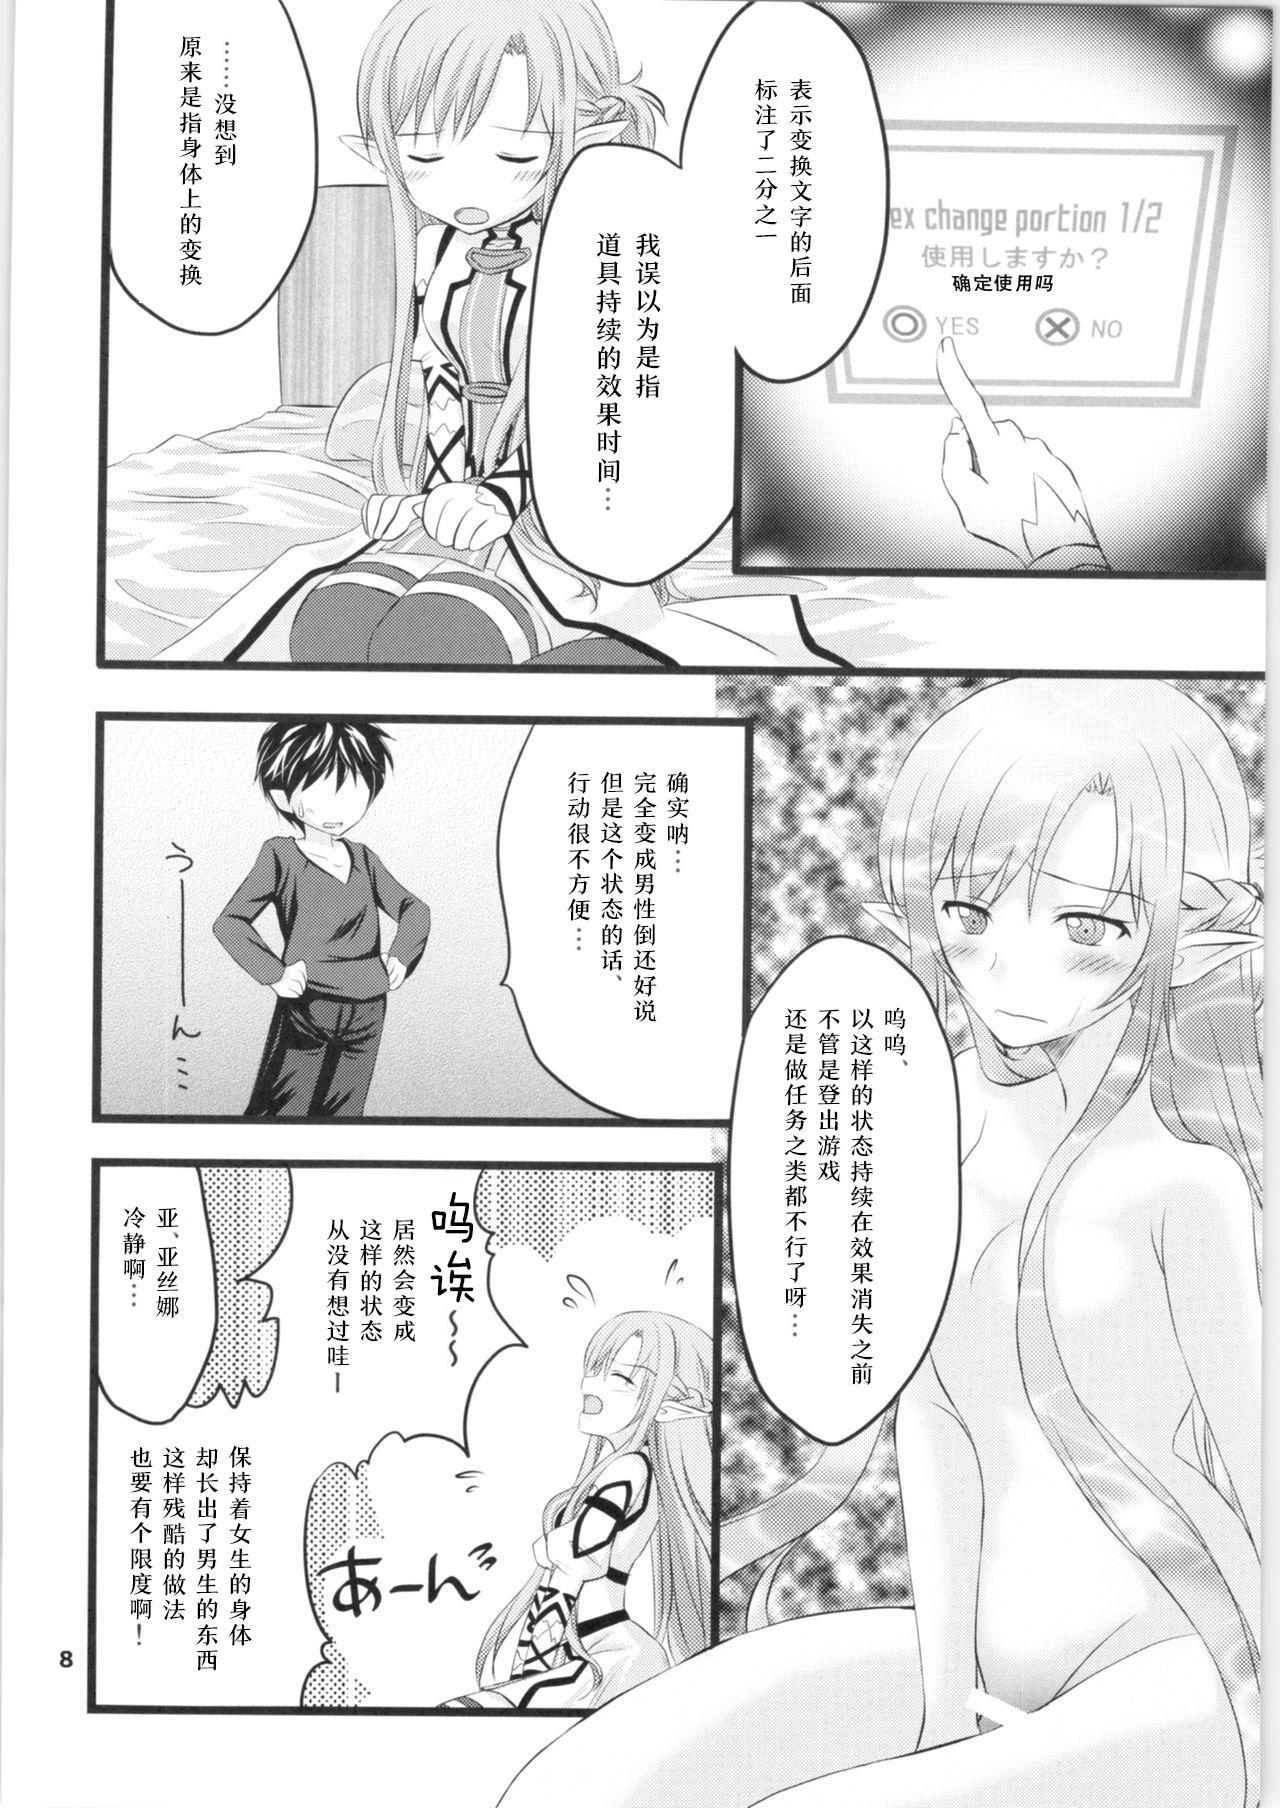 Kiriko-chan to Asobou! 2 6